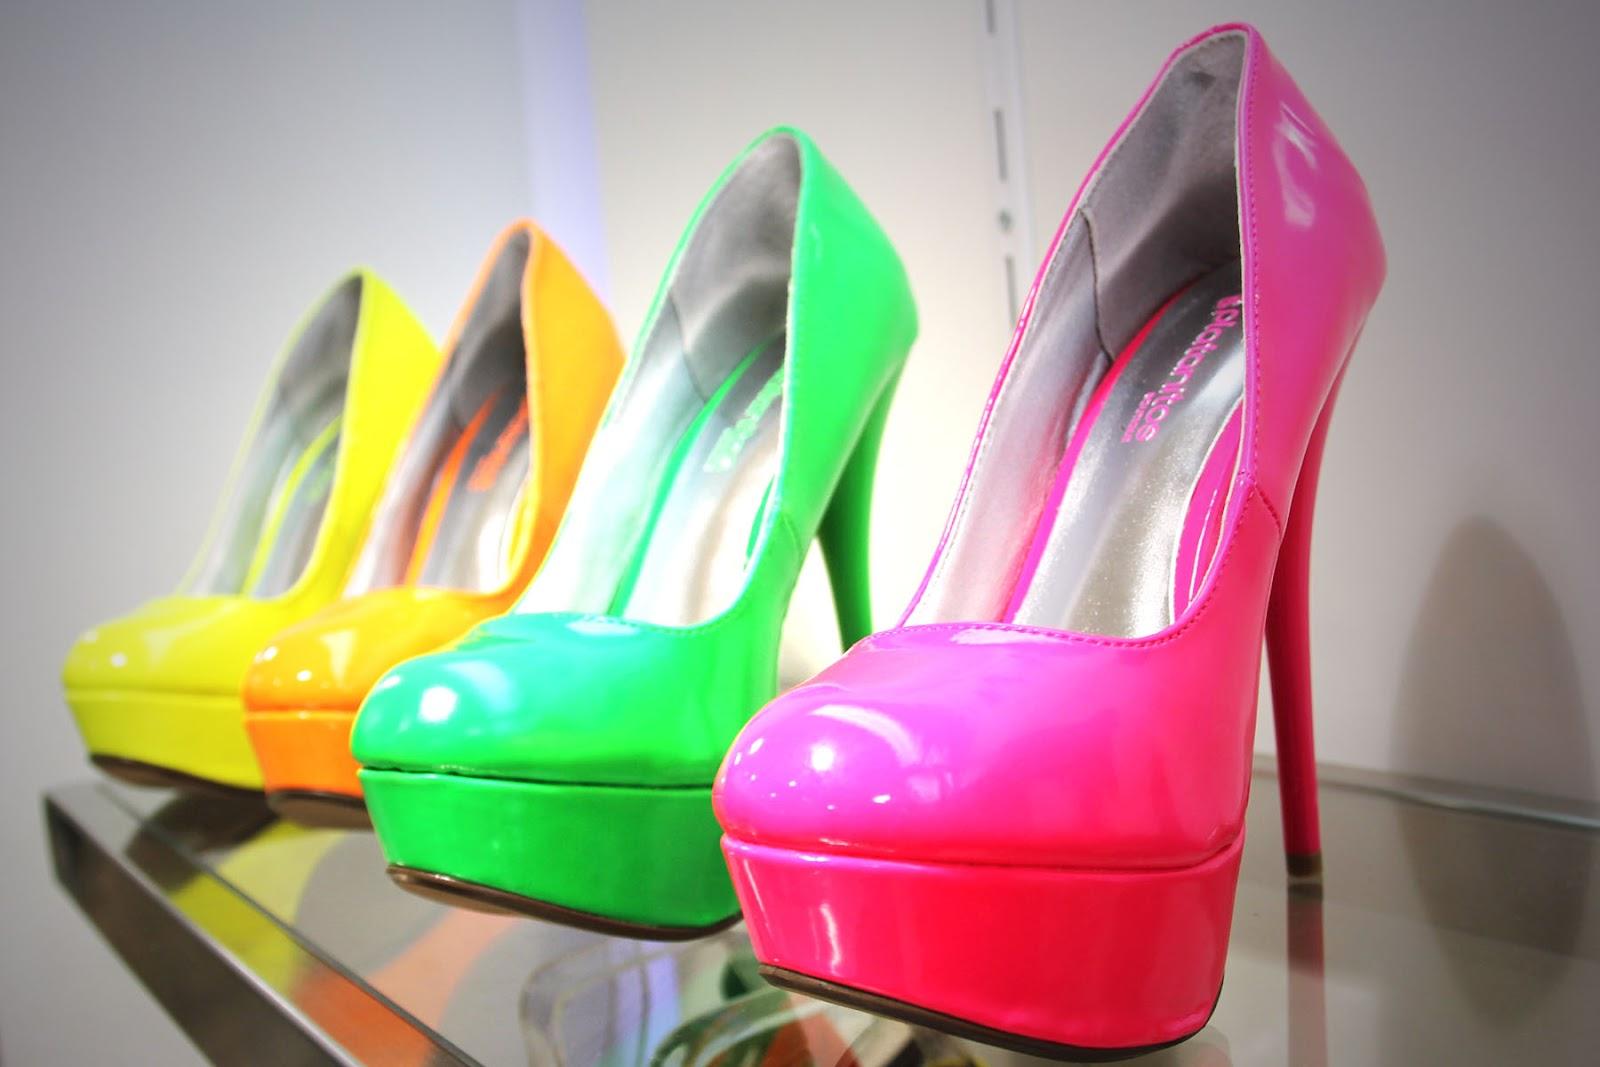 http://3.bp.blogspot.com/-MNVX1N_P3-A/UTX-r84YXrI/AAAAAAAABS4/EqAtVytFxe8/s1600/monita+de+seda.+platanitos.+zapatos.+nueva+coleccion.+primavera+verano+2013.+fashion+blogger.neones.jpg